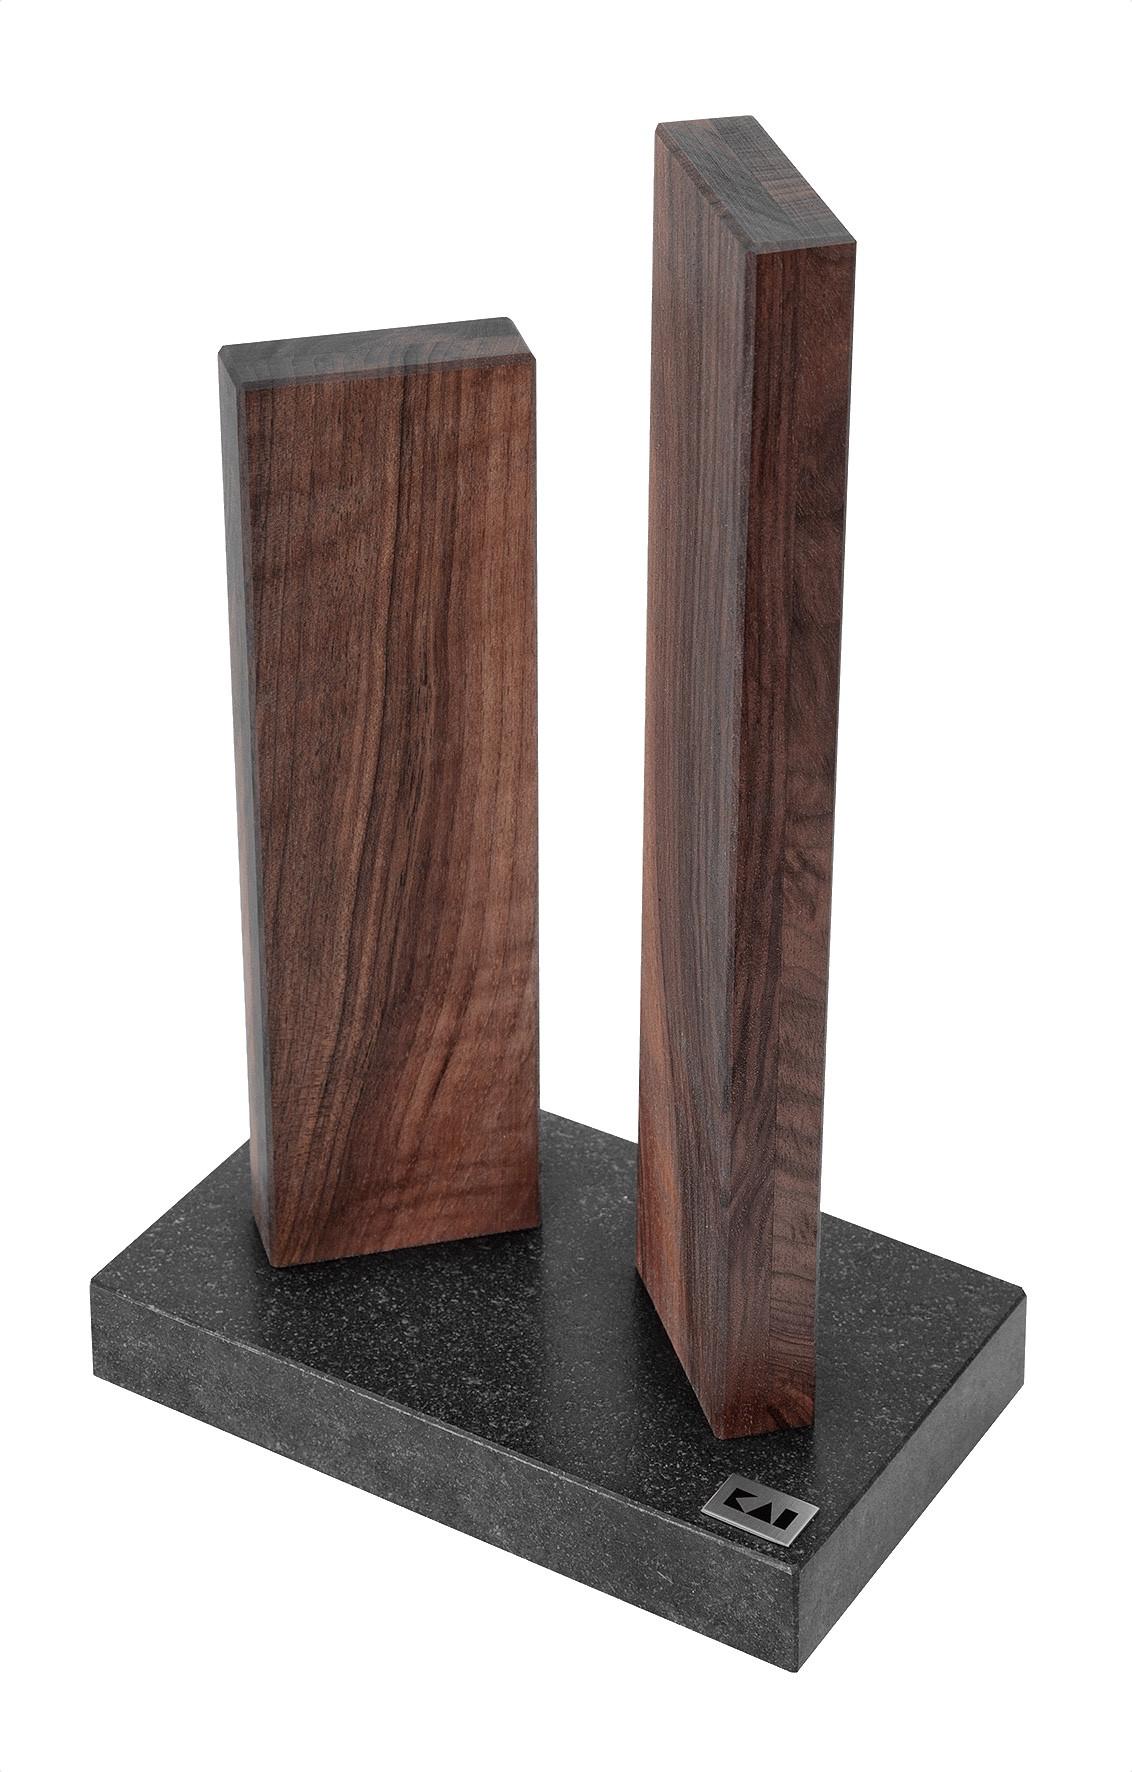 KAI Messerbock Stonehenge Small Walnuss/Granit